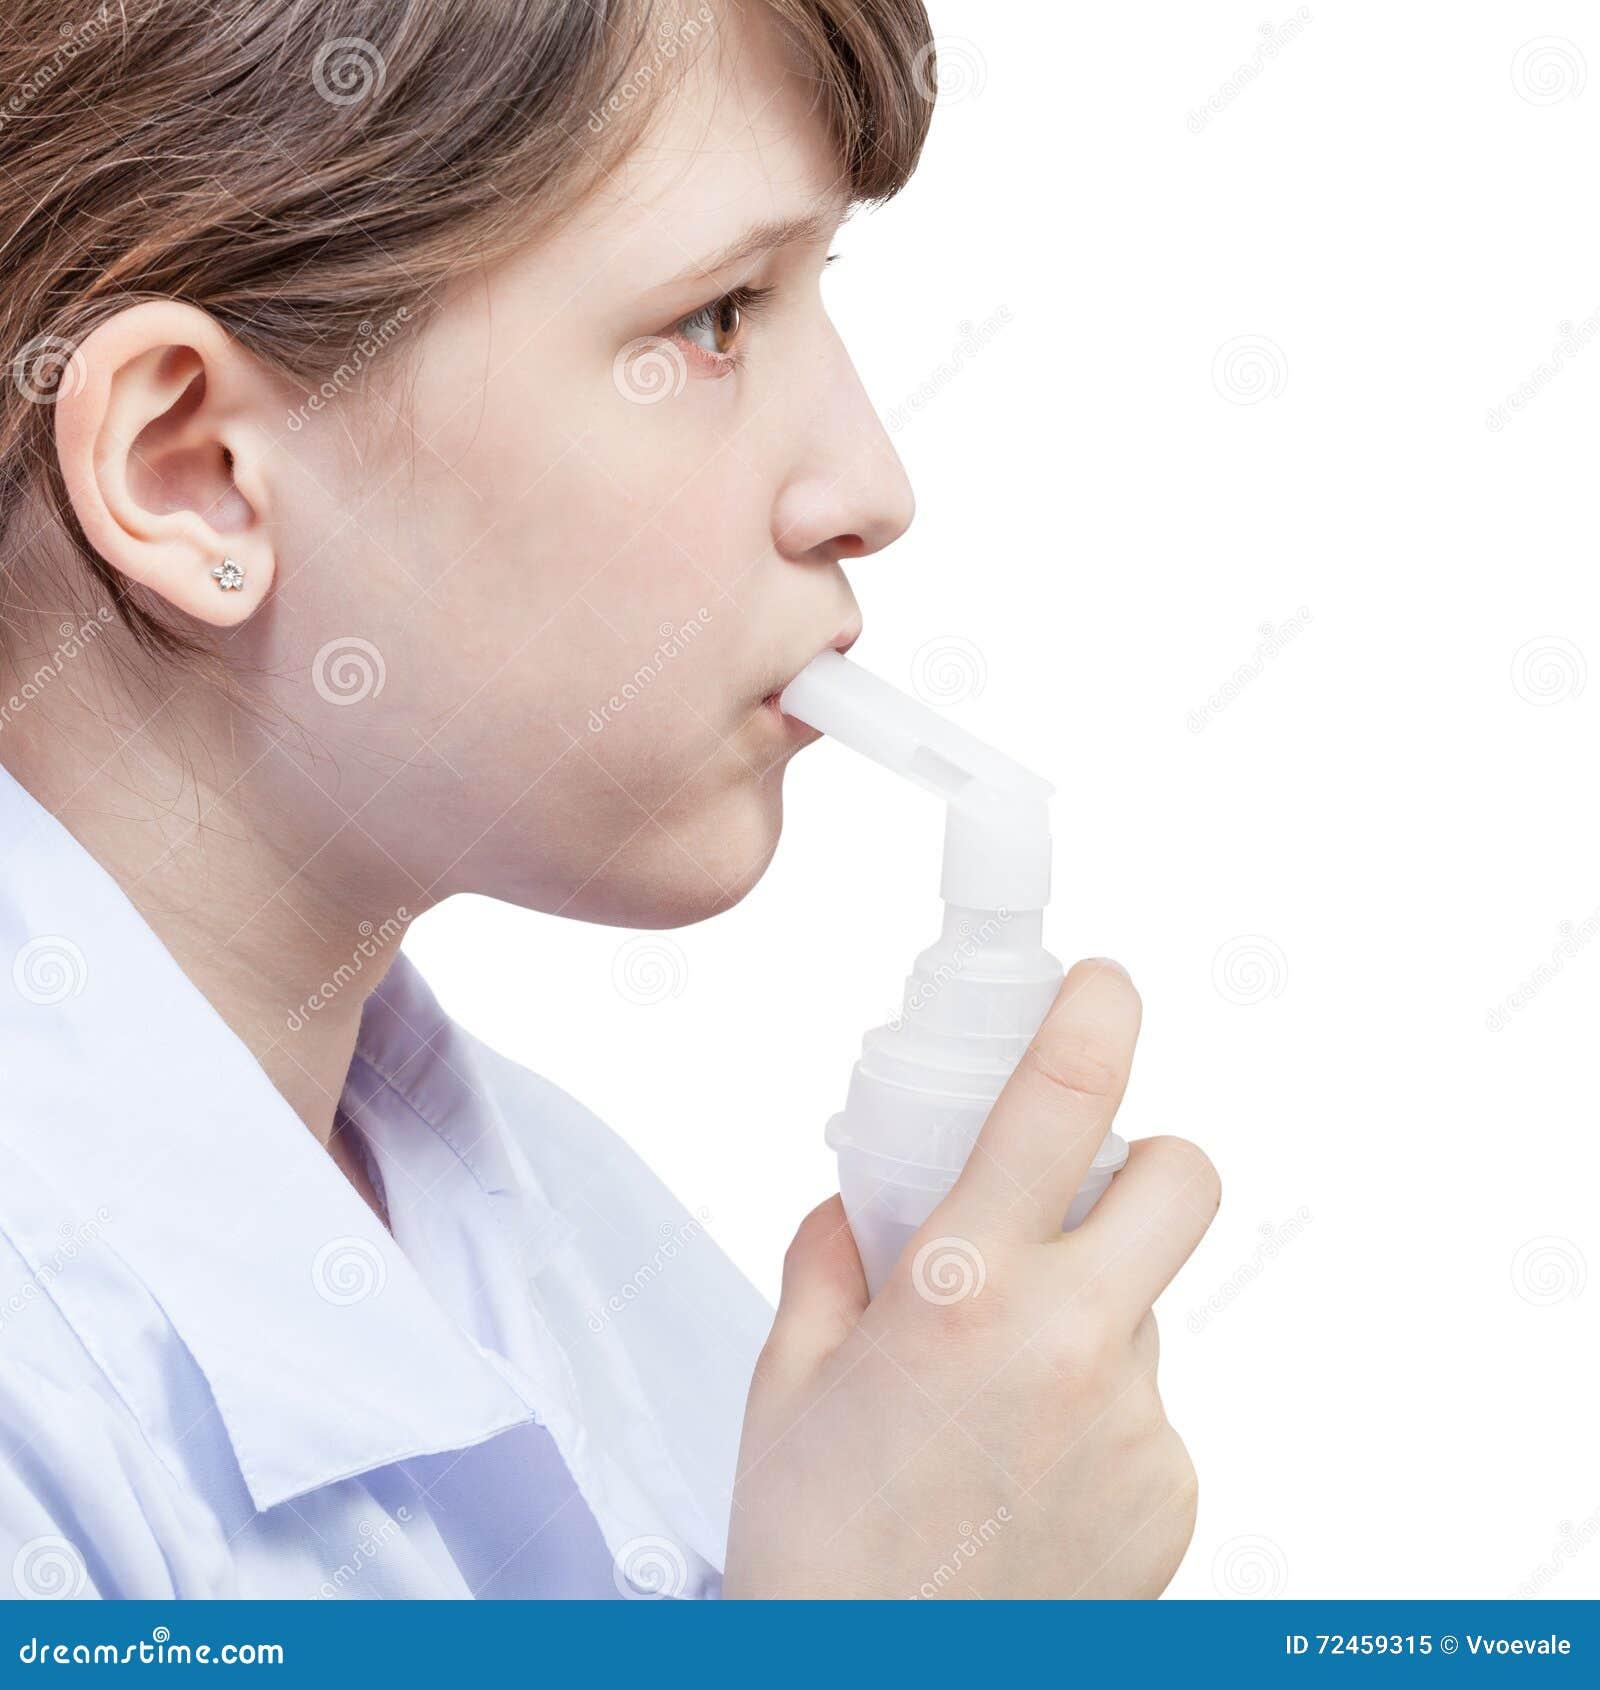 La muchacha inhala con la boquilla del nebulizador del jet